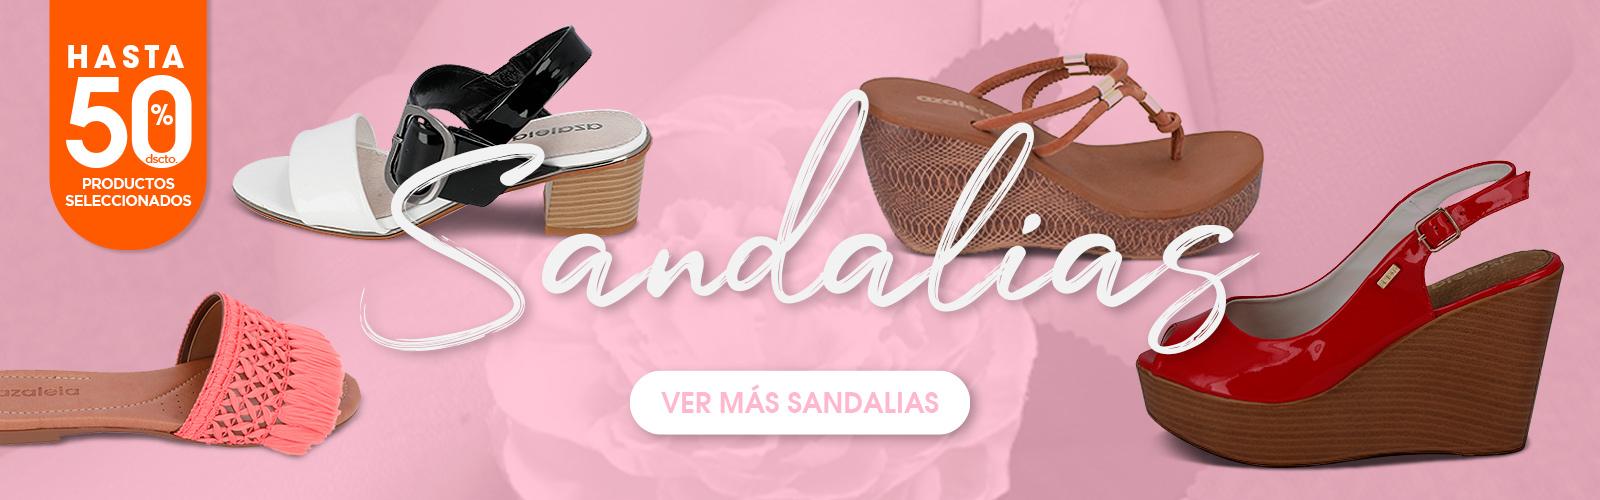 sandalias50